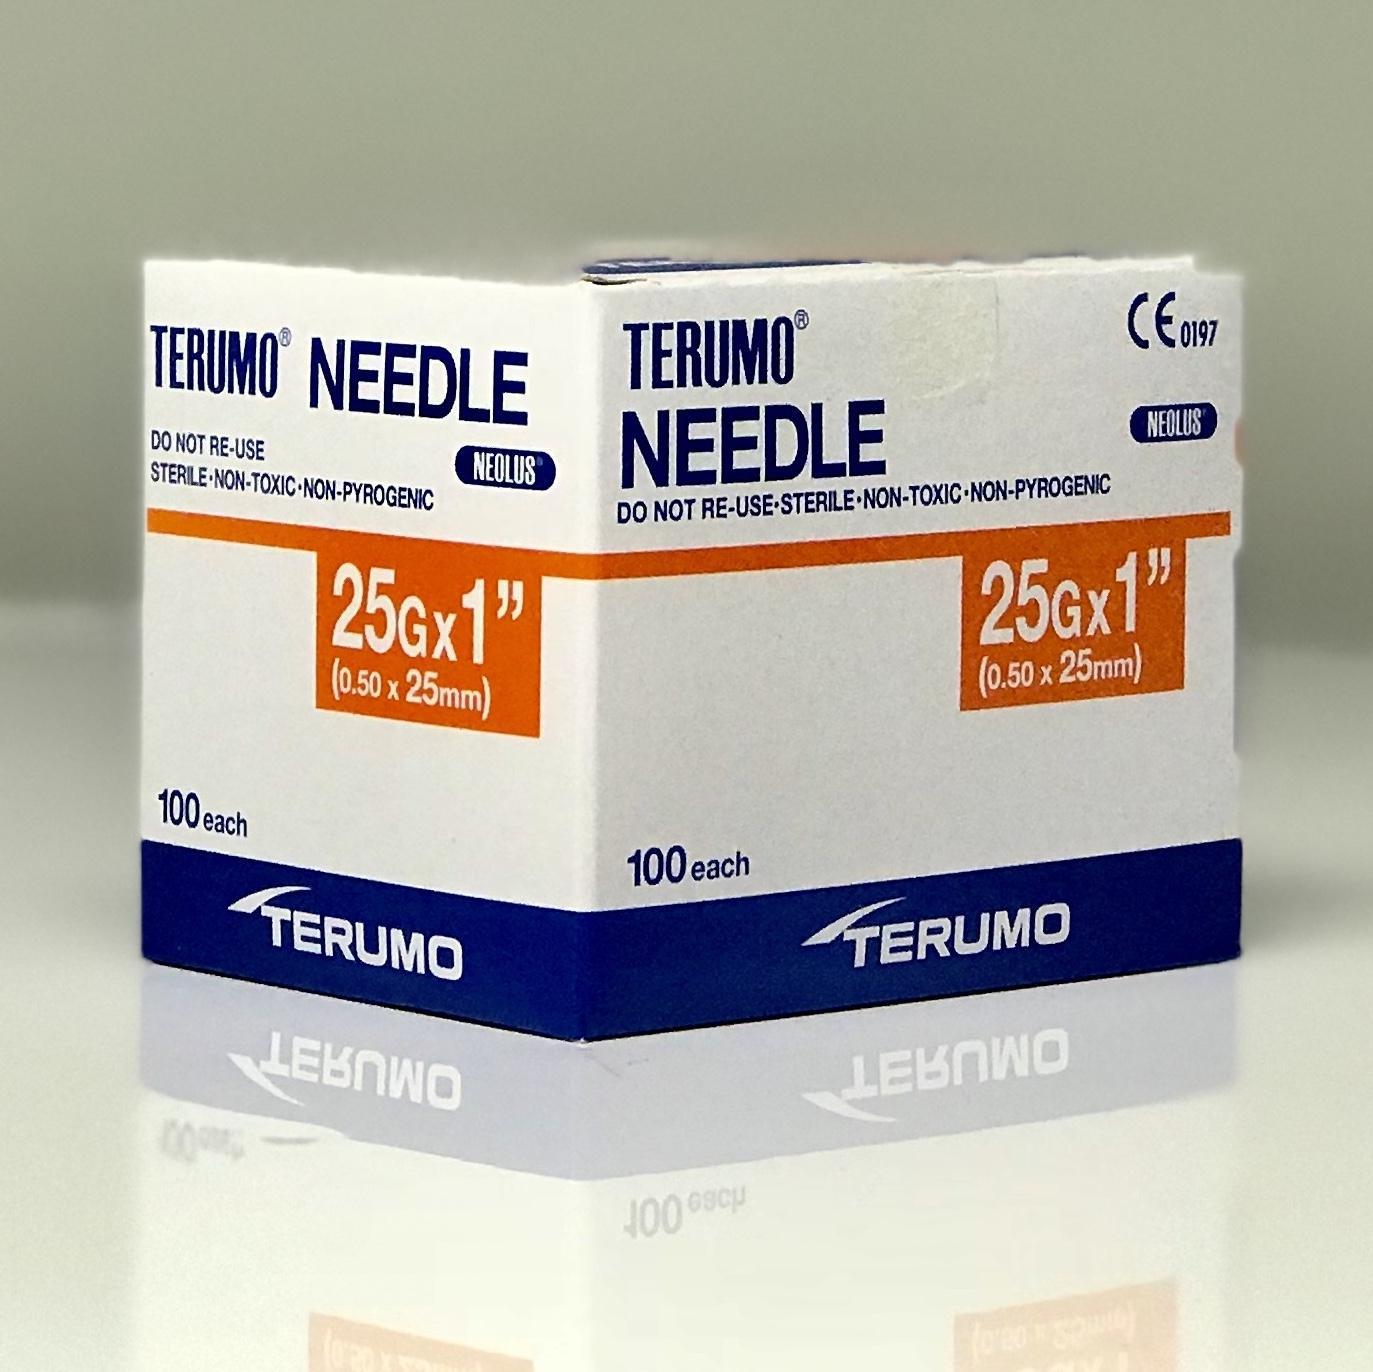 TERUMO NEEDLE 25Gx25MM NN2525RL, BOX 100